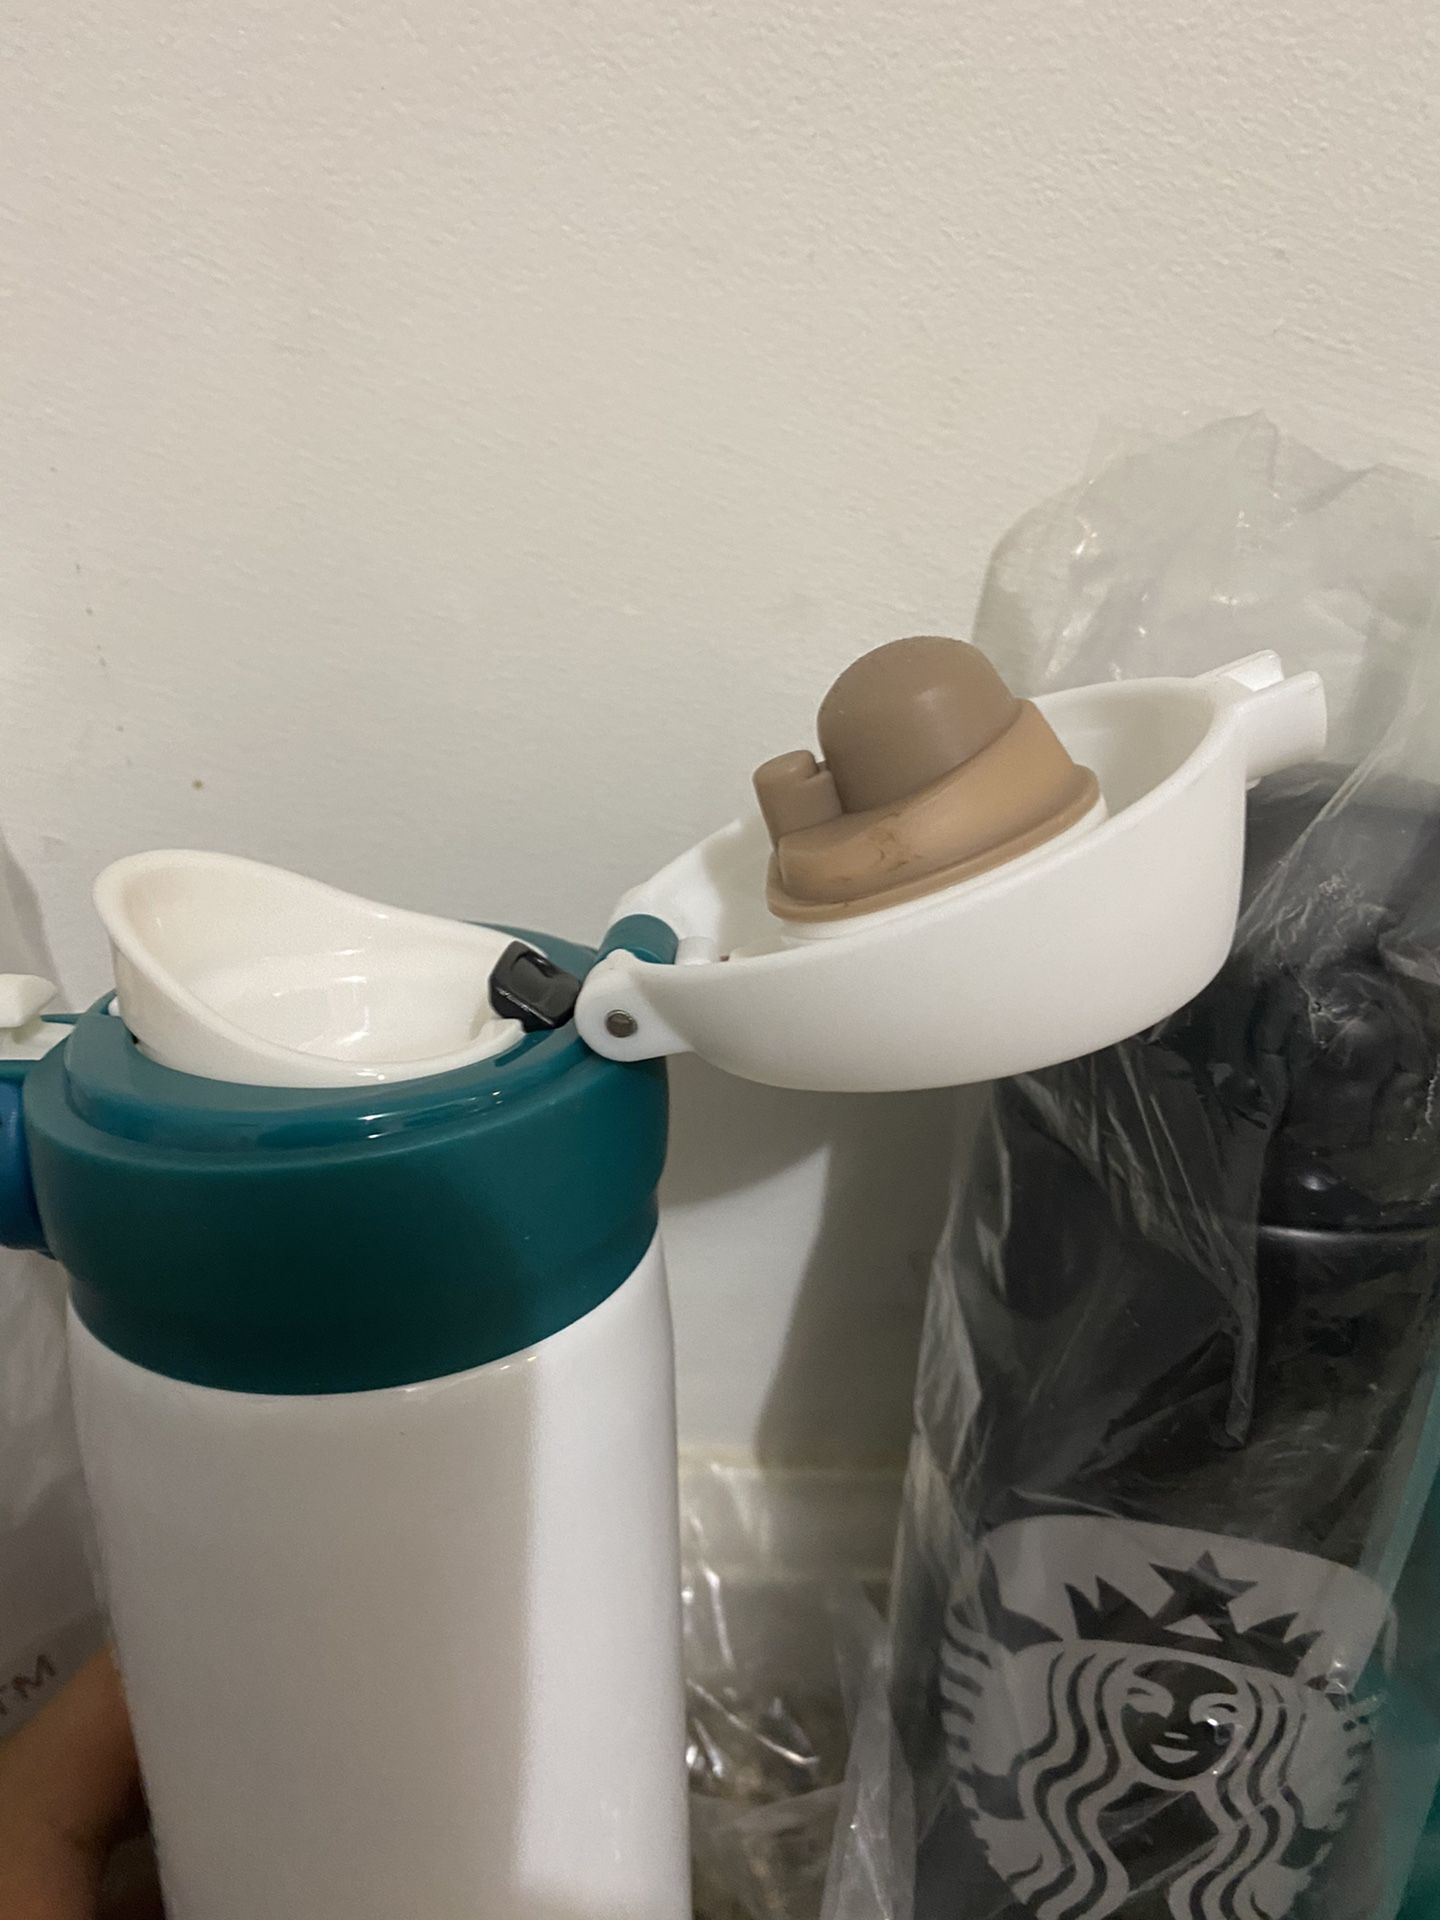 STARBUCKS COFFEE STAINLESS STEEL CUPS 16OZ